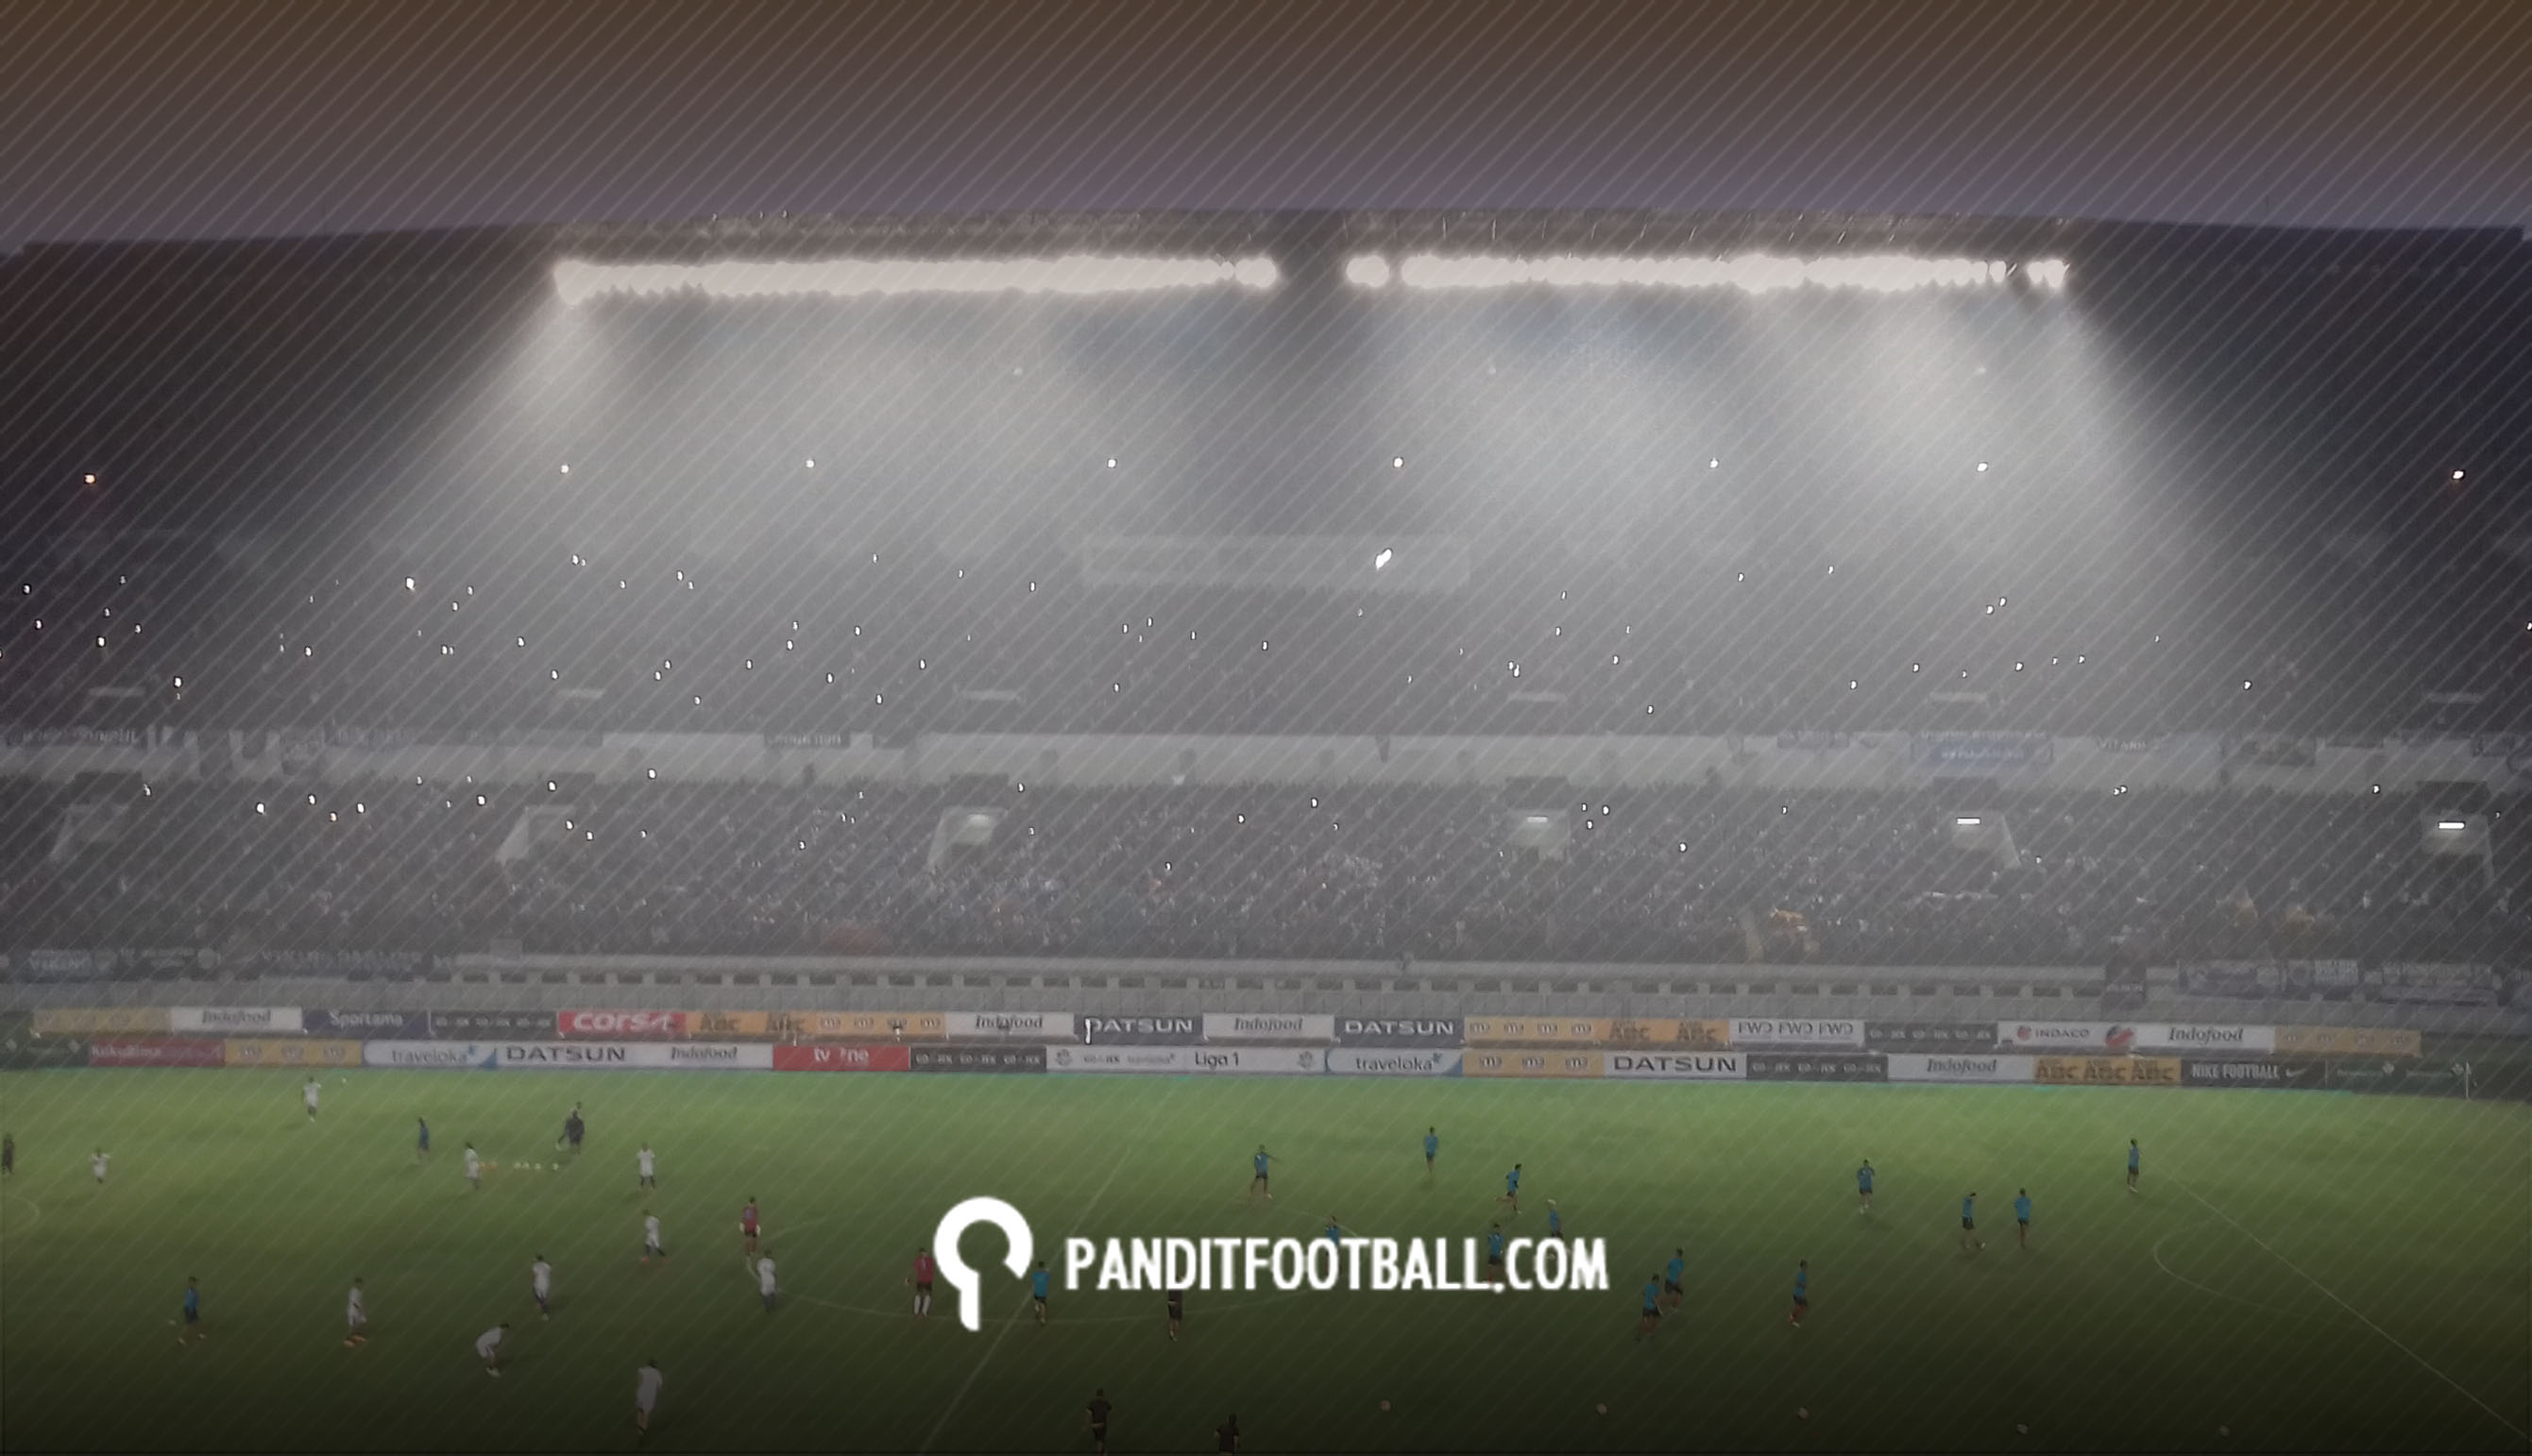 Kapan Sebaiknya Waktu Pertandingan Liga 1 Dimulai Saat Ramadan?